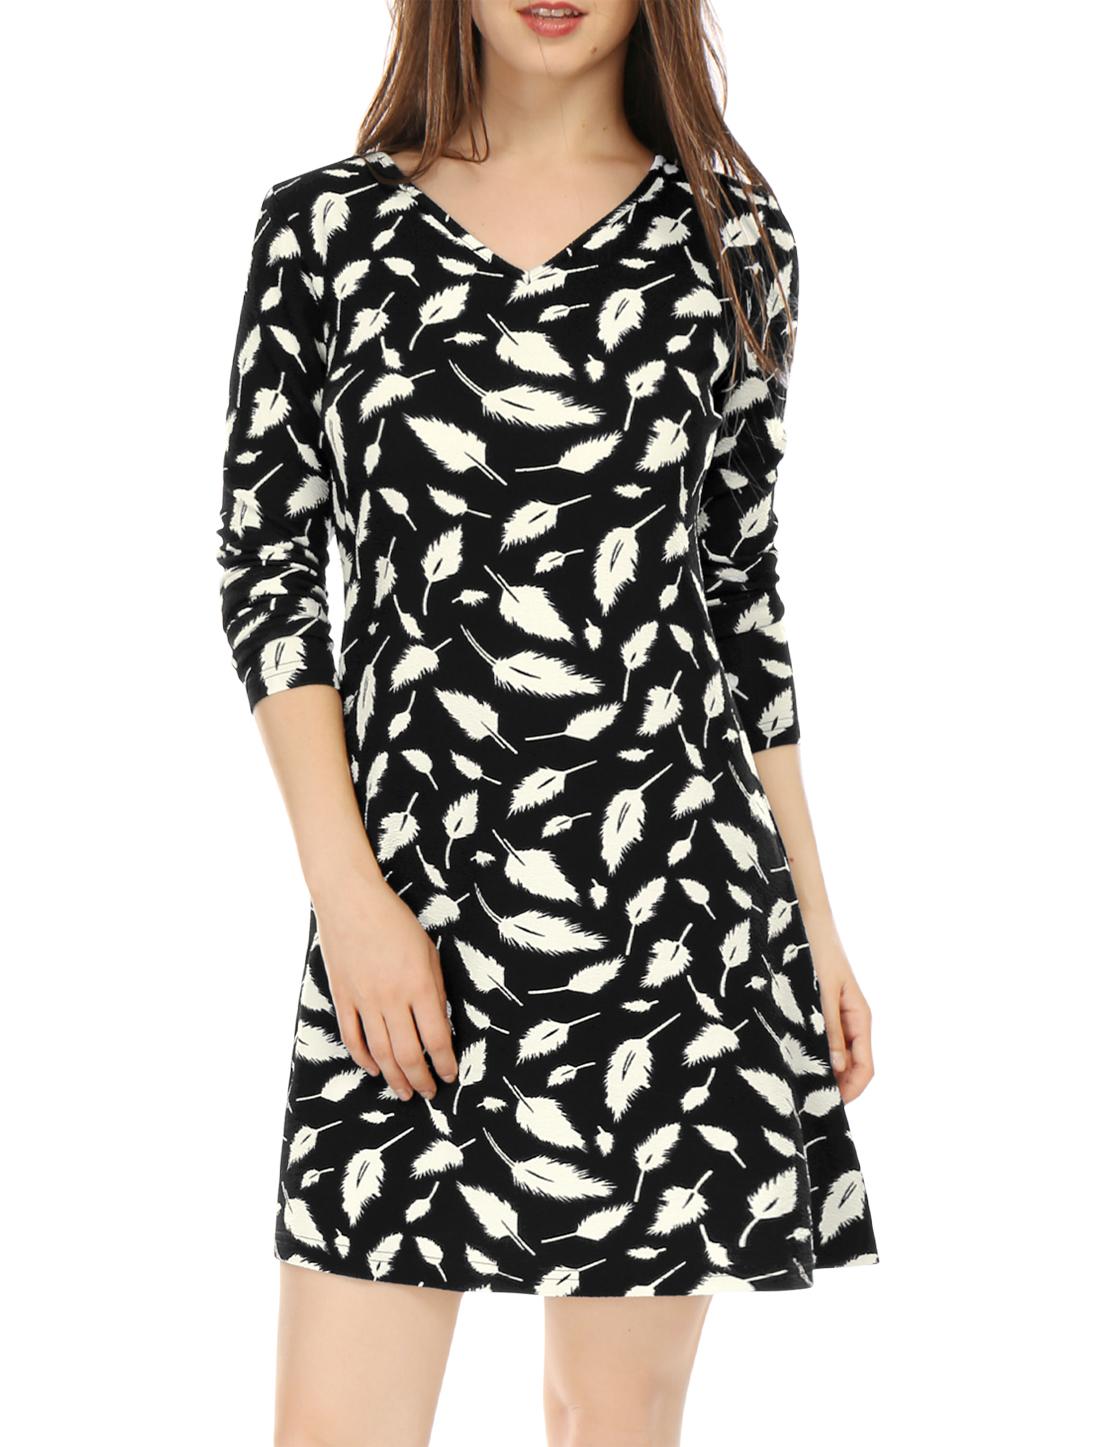 Women V Neck Long Sleeves Feather Print Mini Dress Black XL